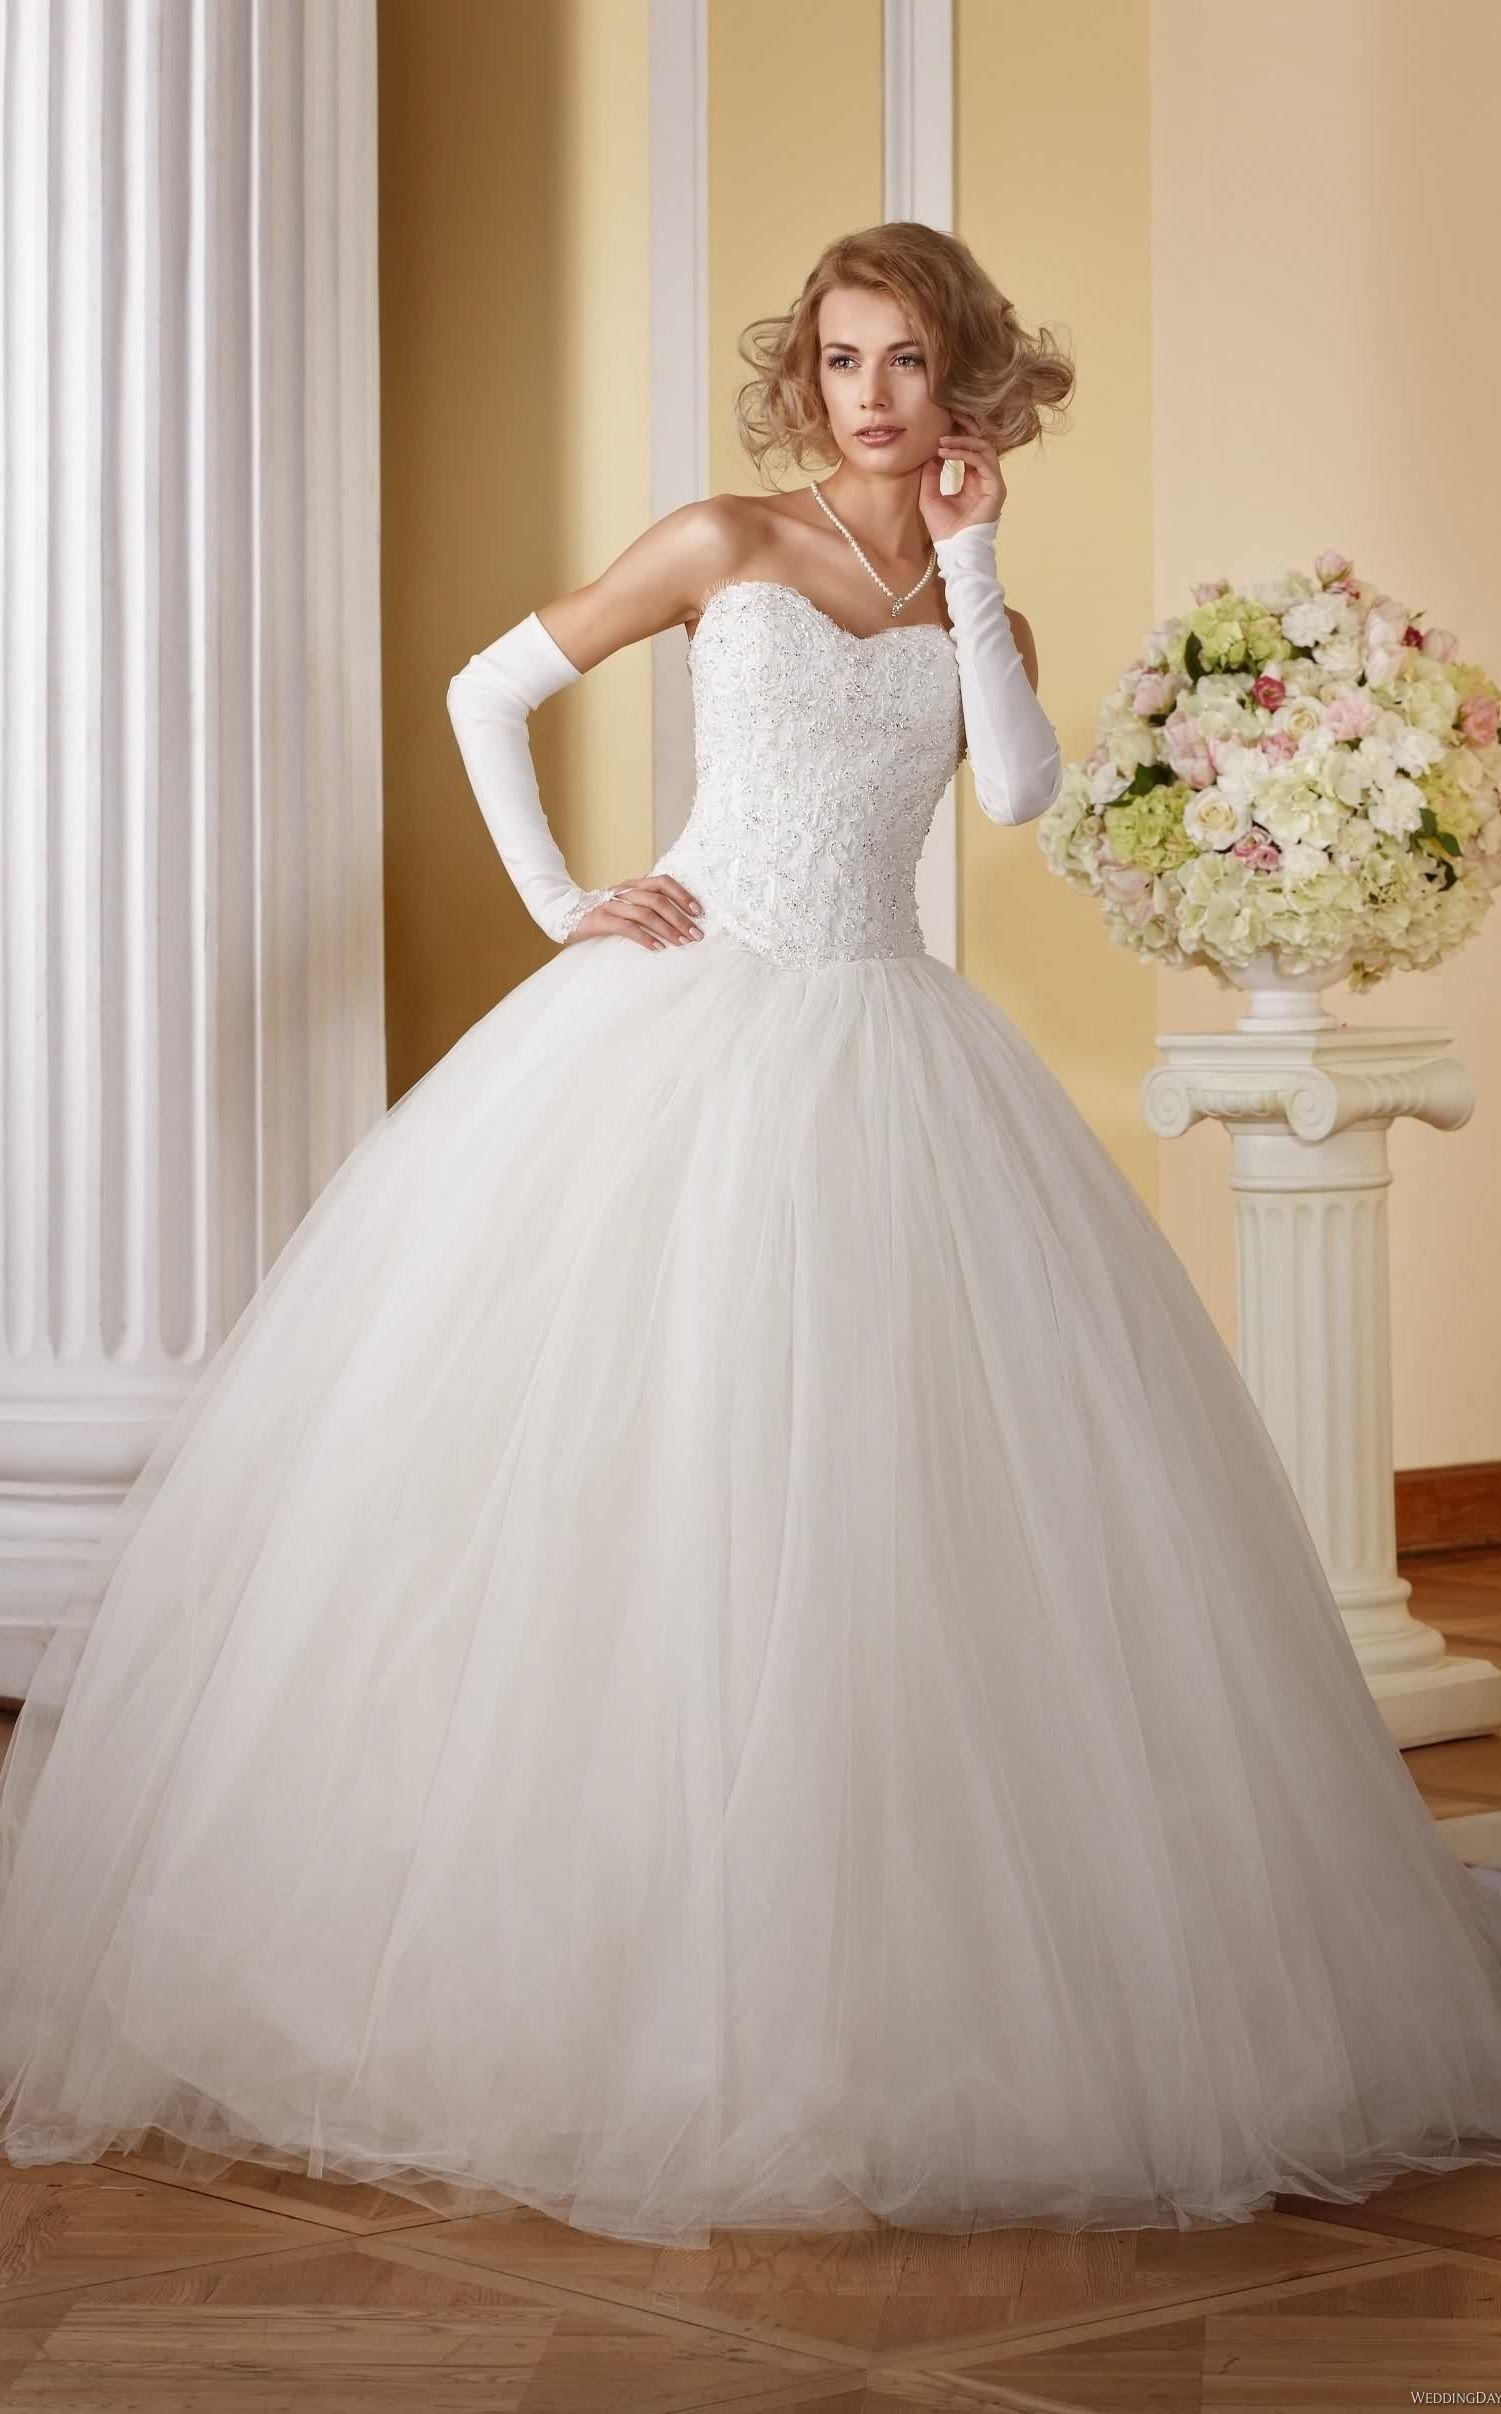 classic Cinderella wedding dress, by Affezione | Disney Princess ...